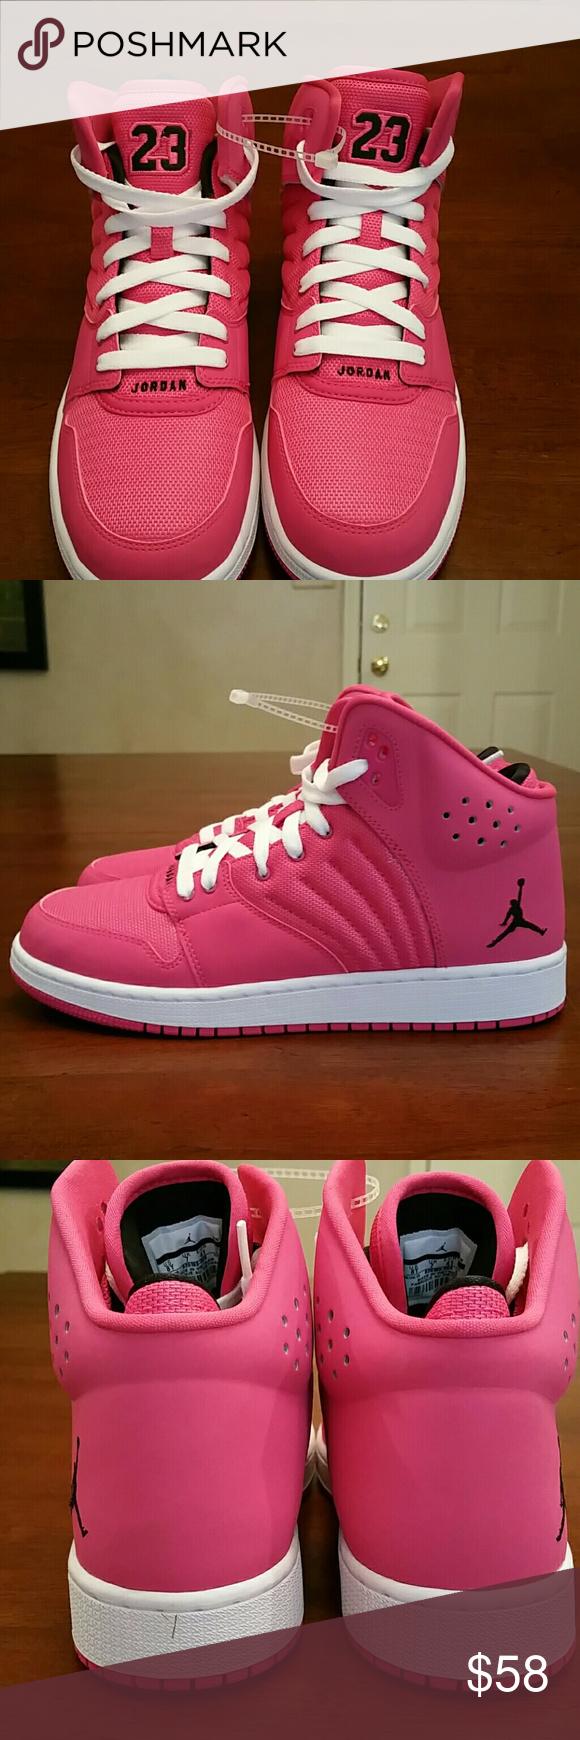 c60cb2b0e845 Nike Air Jordan 1 Flight 4 GG Big Girl Size 8 Michael Jordan youth fashion  sneakers size 8y fits an adult size (9 - 9.5) 10